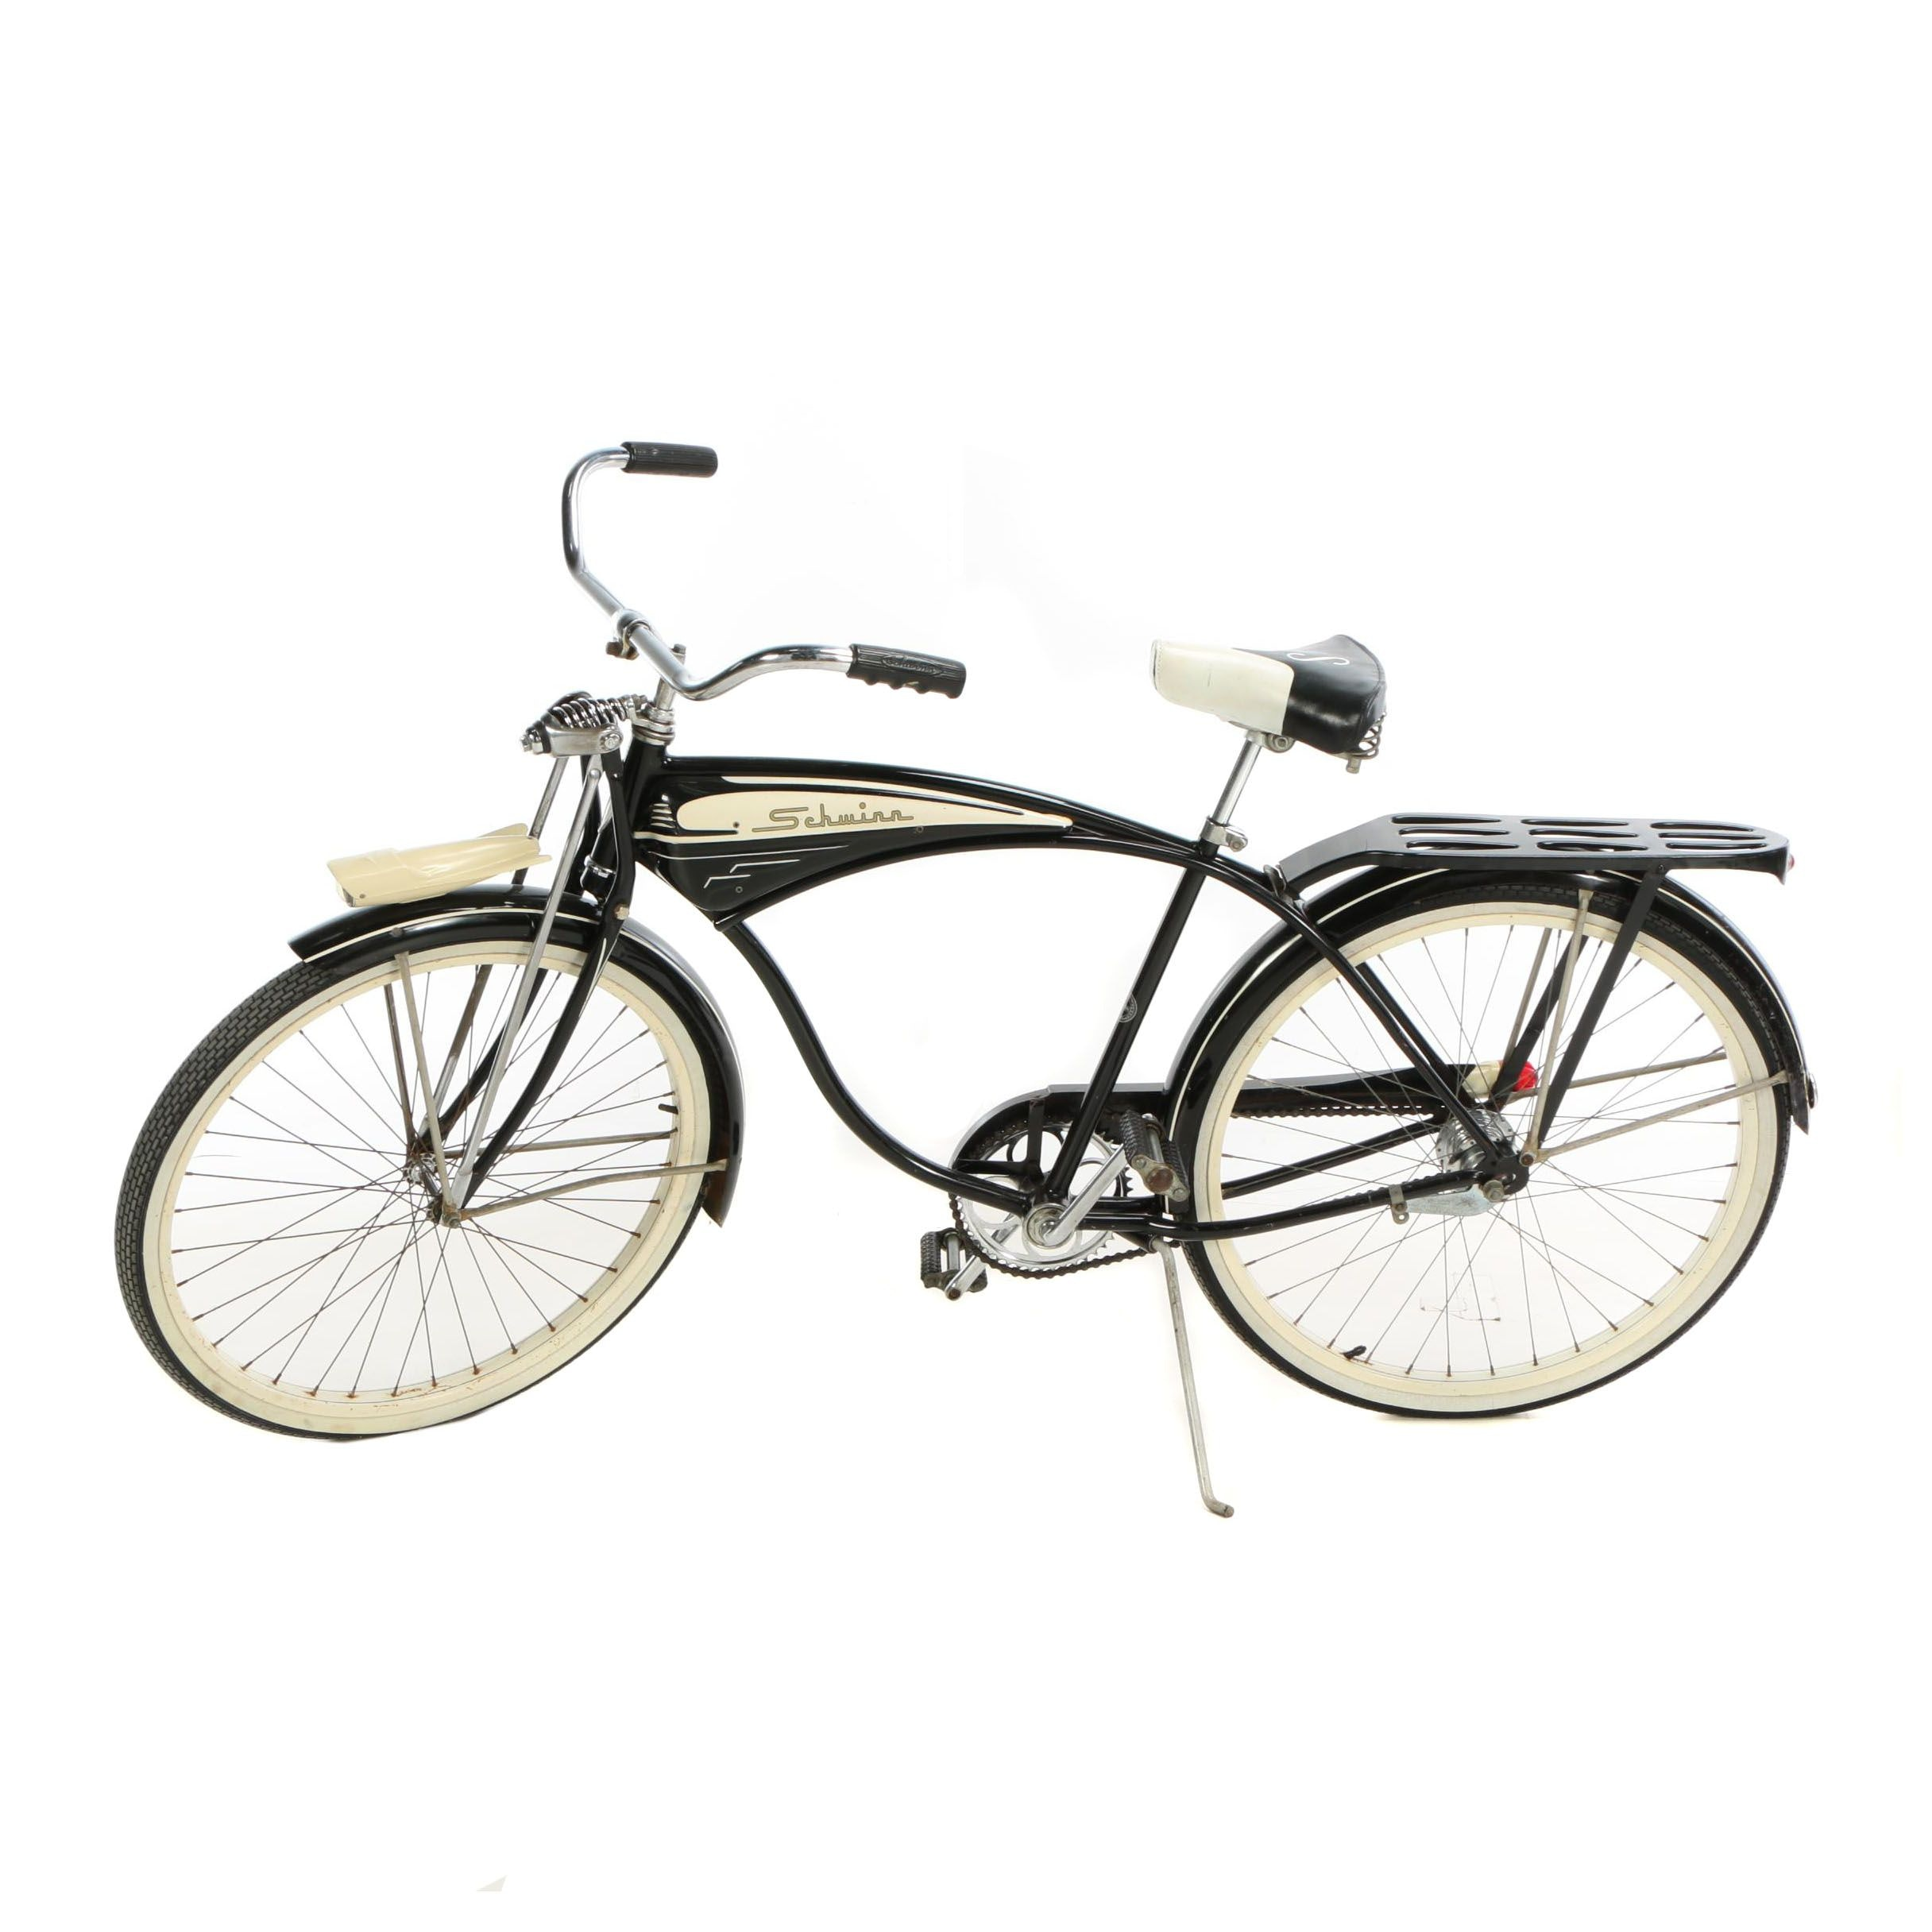 "Schwinn ""Hornet"" Men's Cruiser Bicycle, 1952-1964"